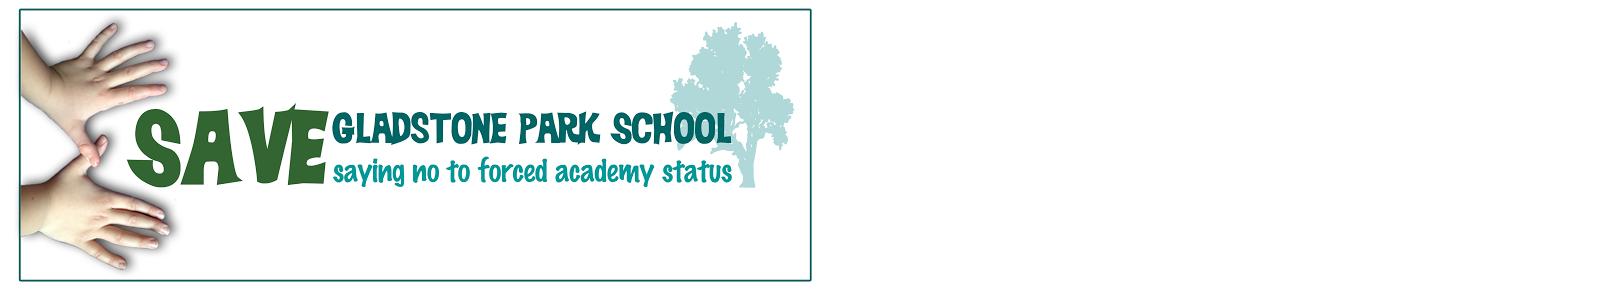 Save Gladstone Park School